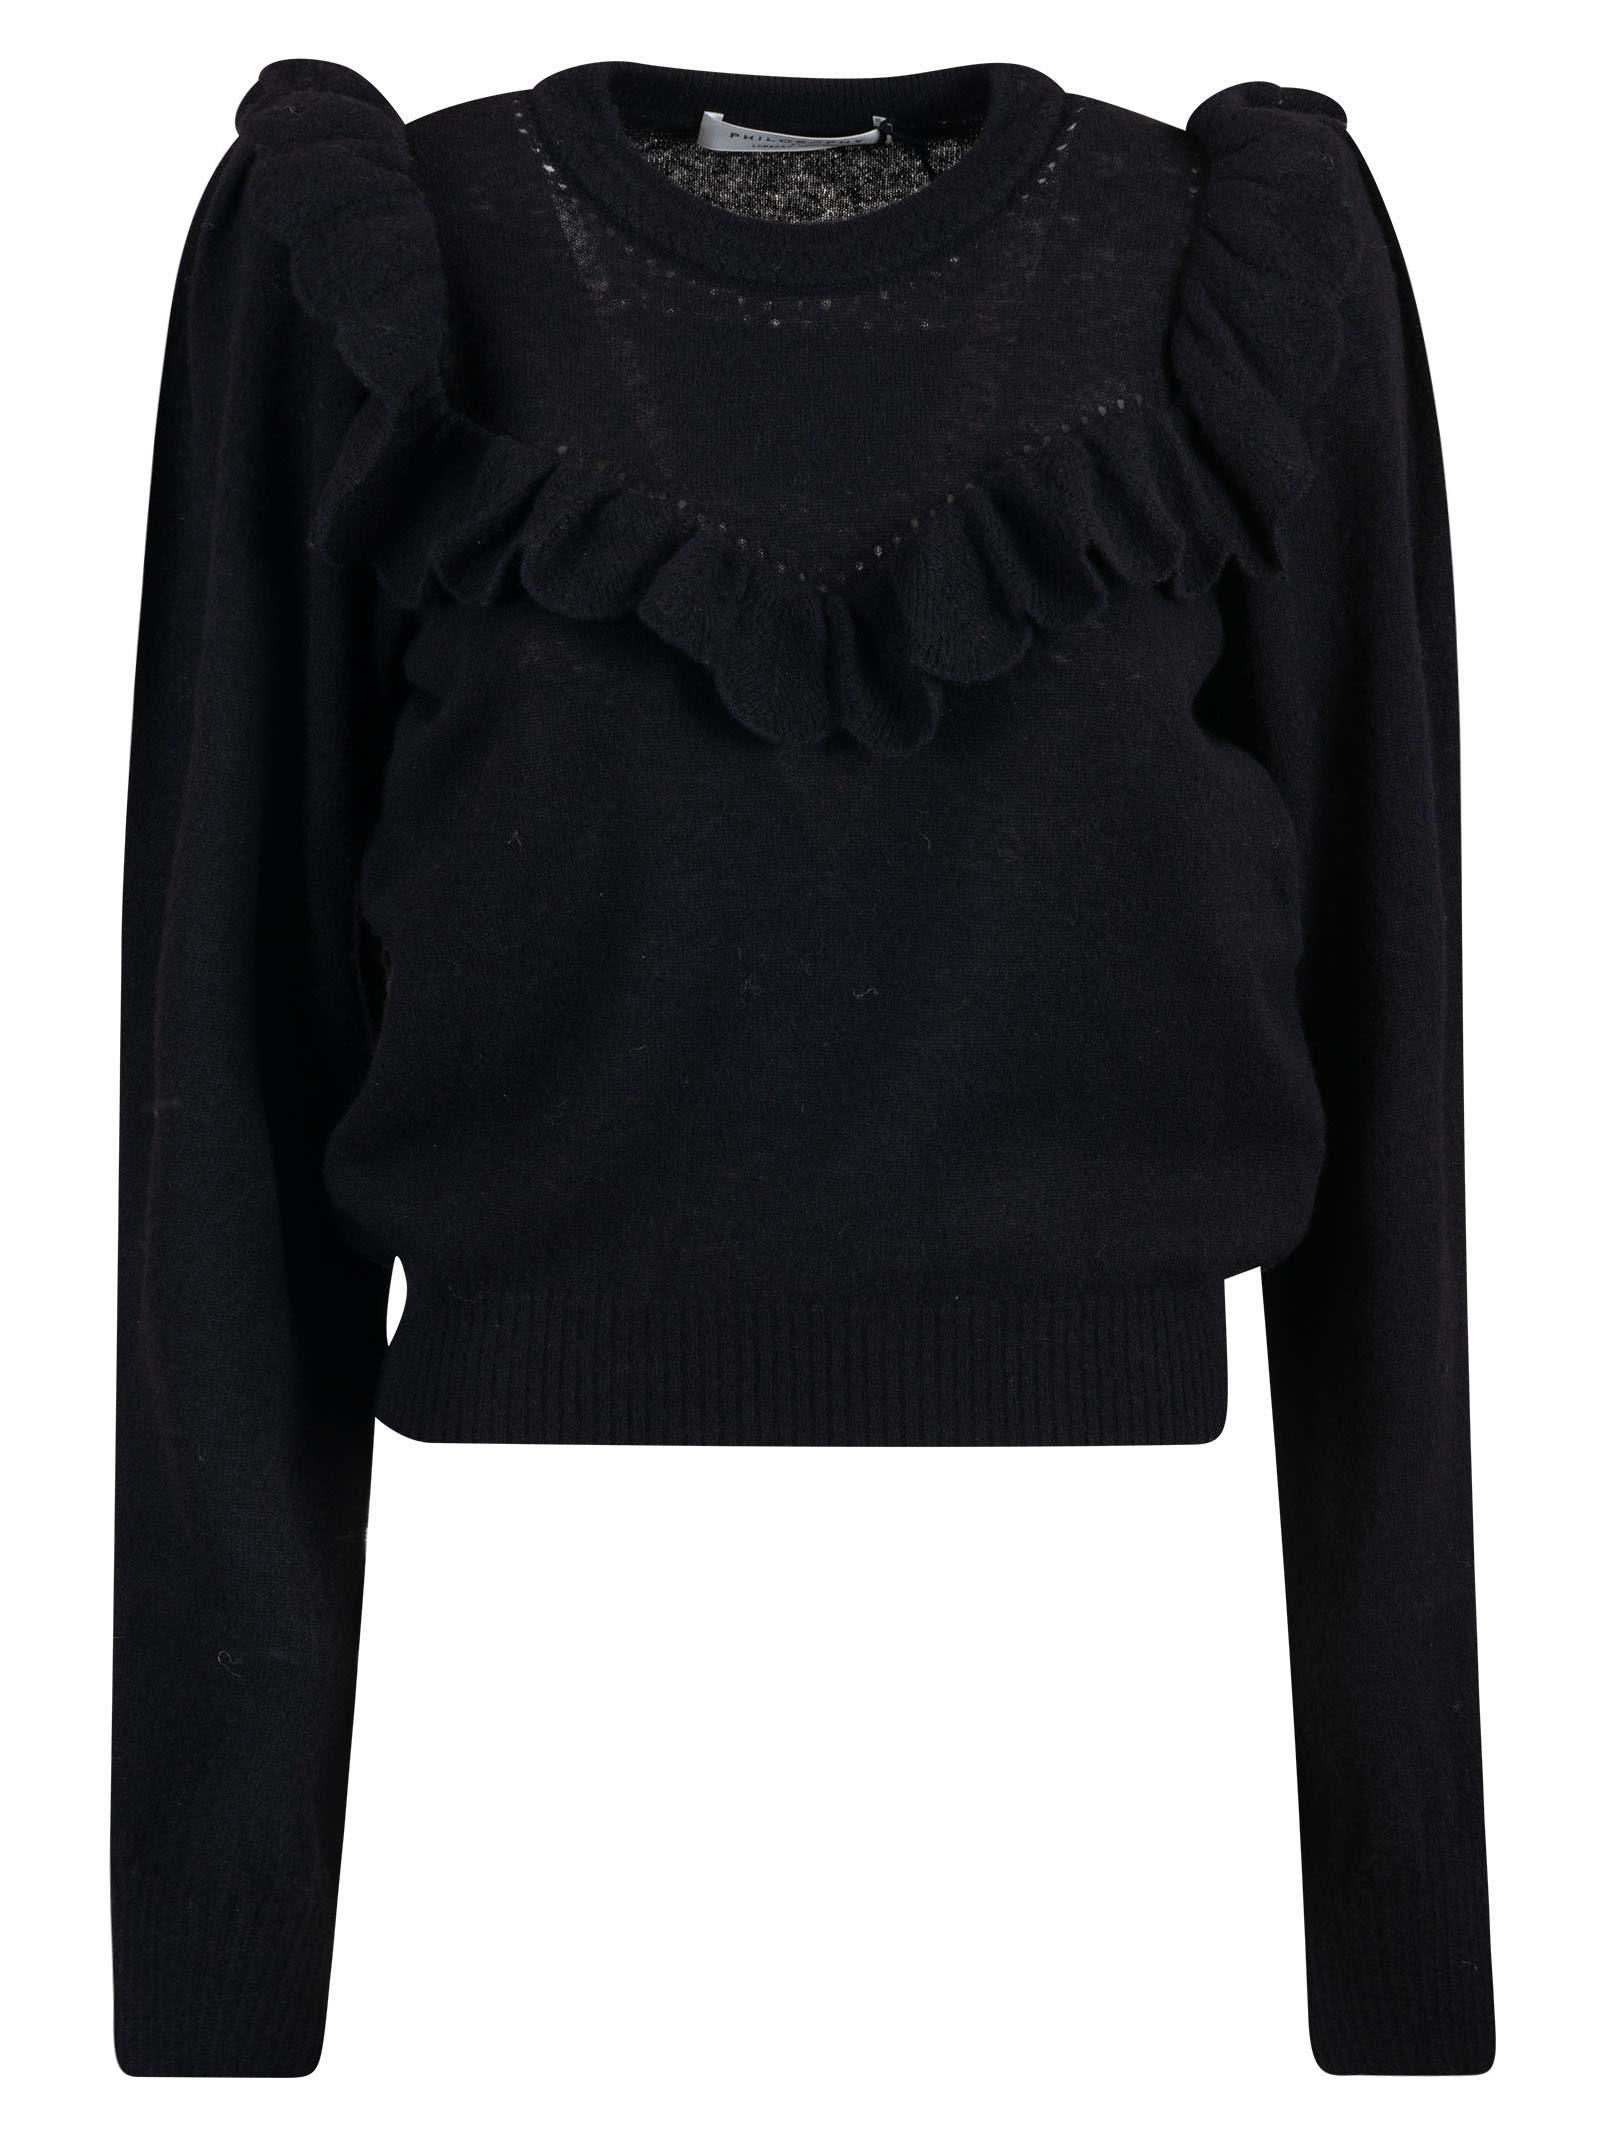 Philosophy di Lorenzo Serafini Ruffle Applique Ribbed Sweater